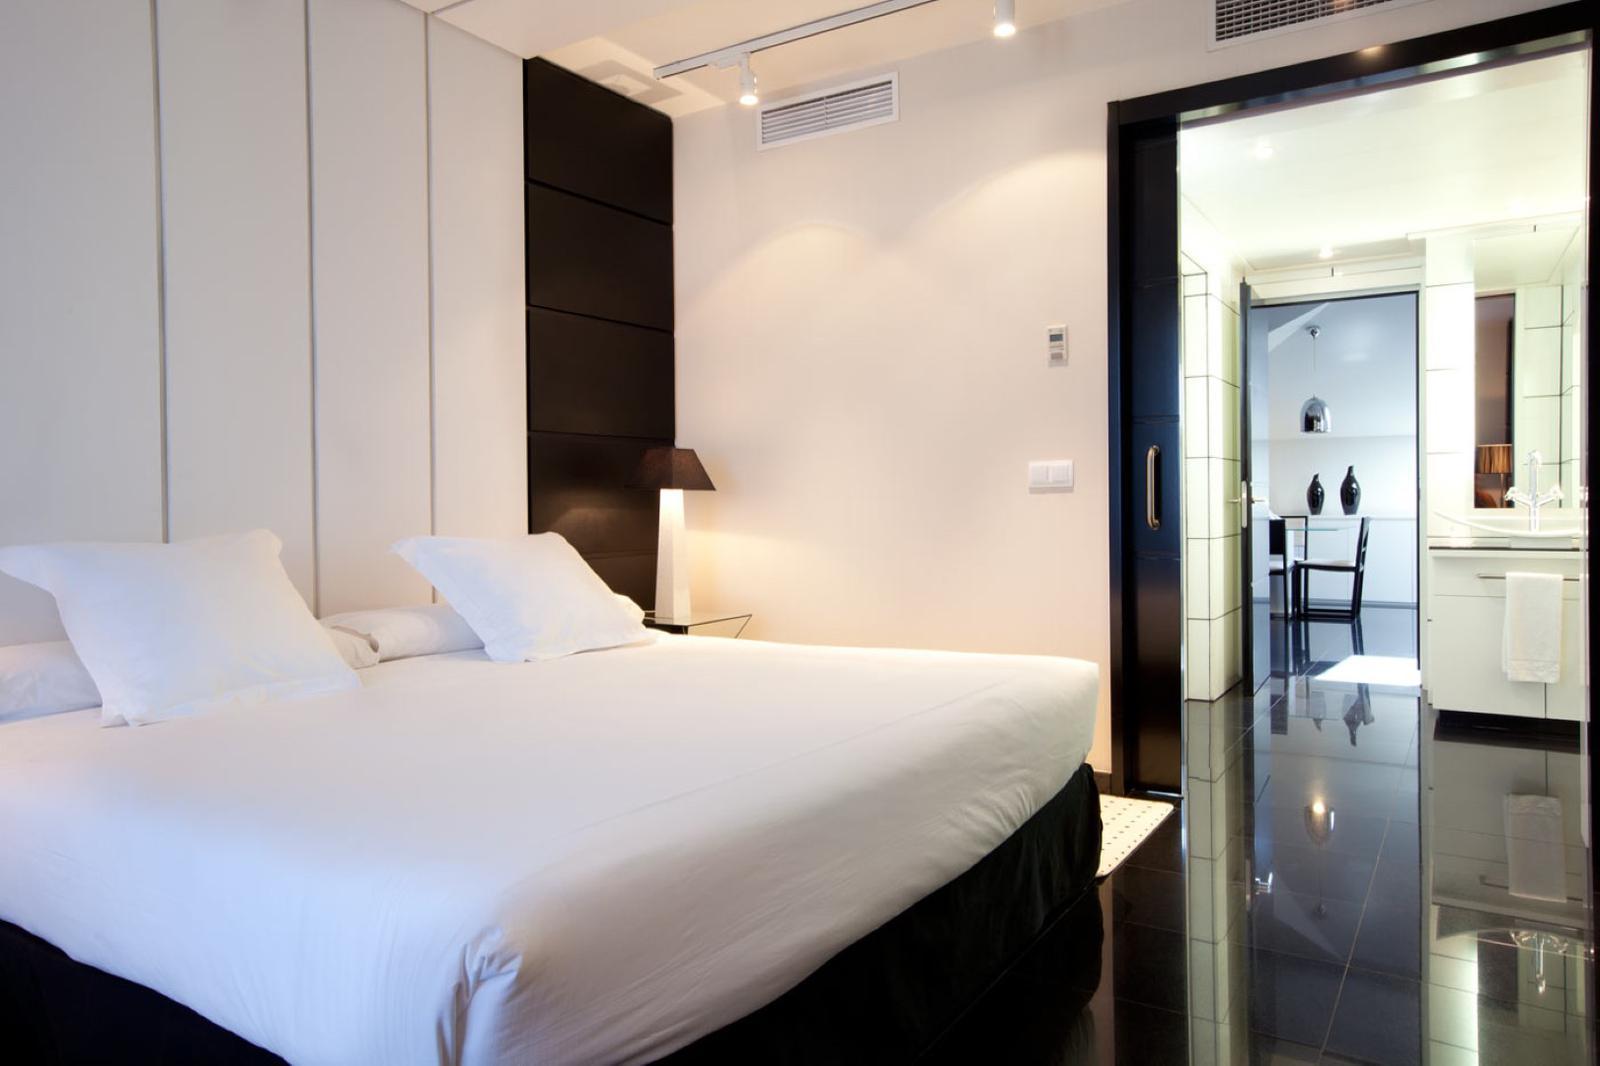 mejores hoteles de murcia